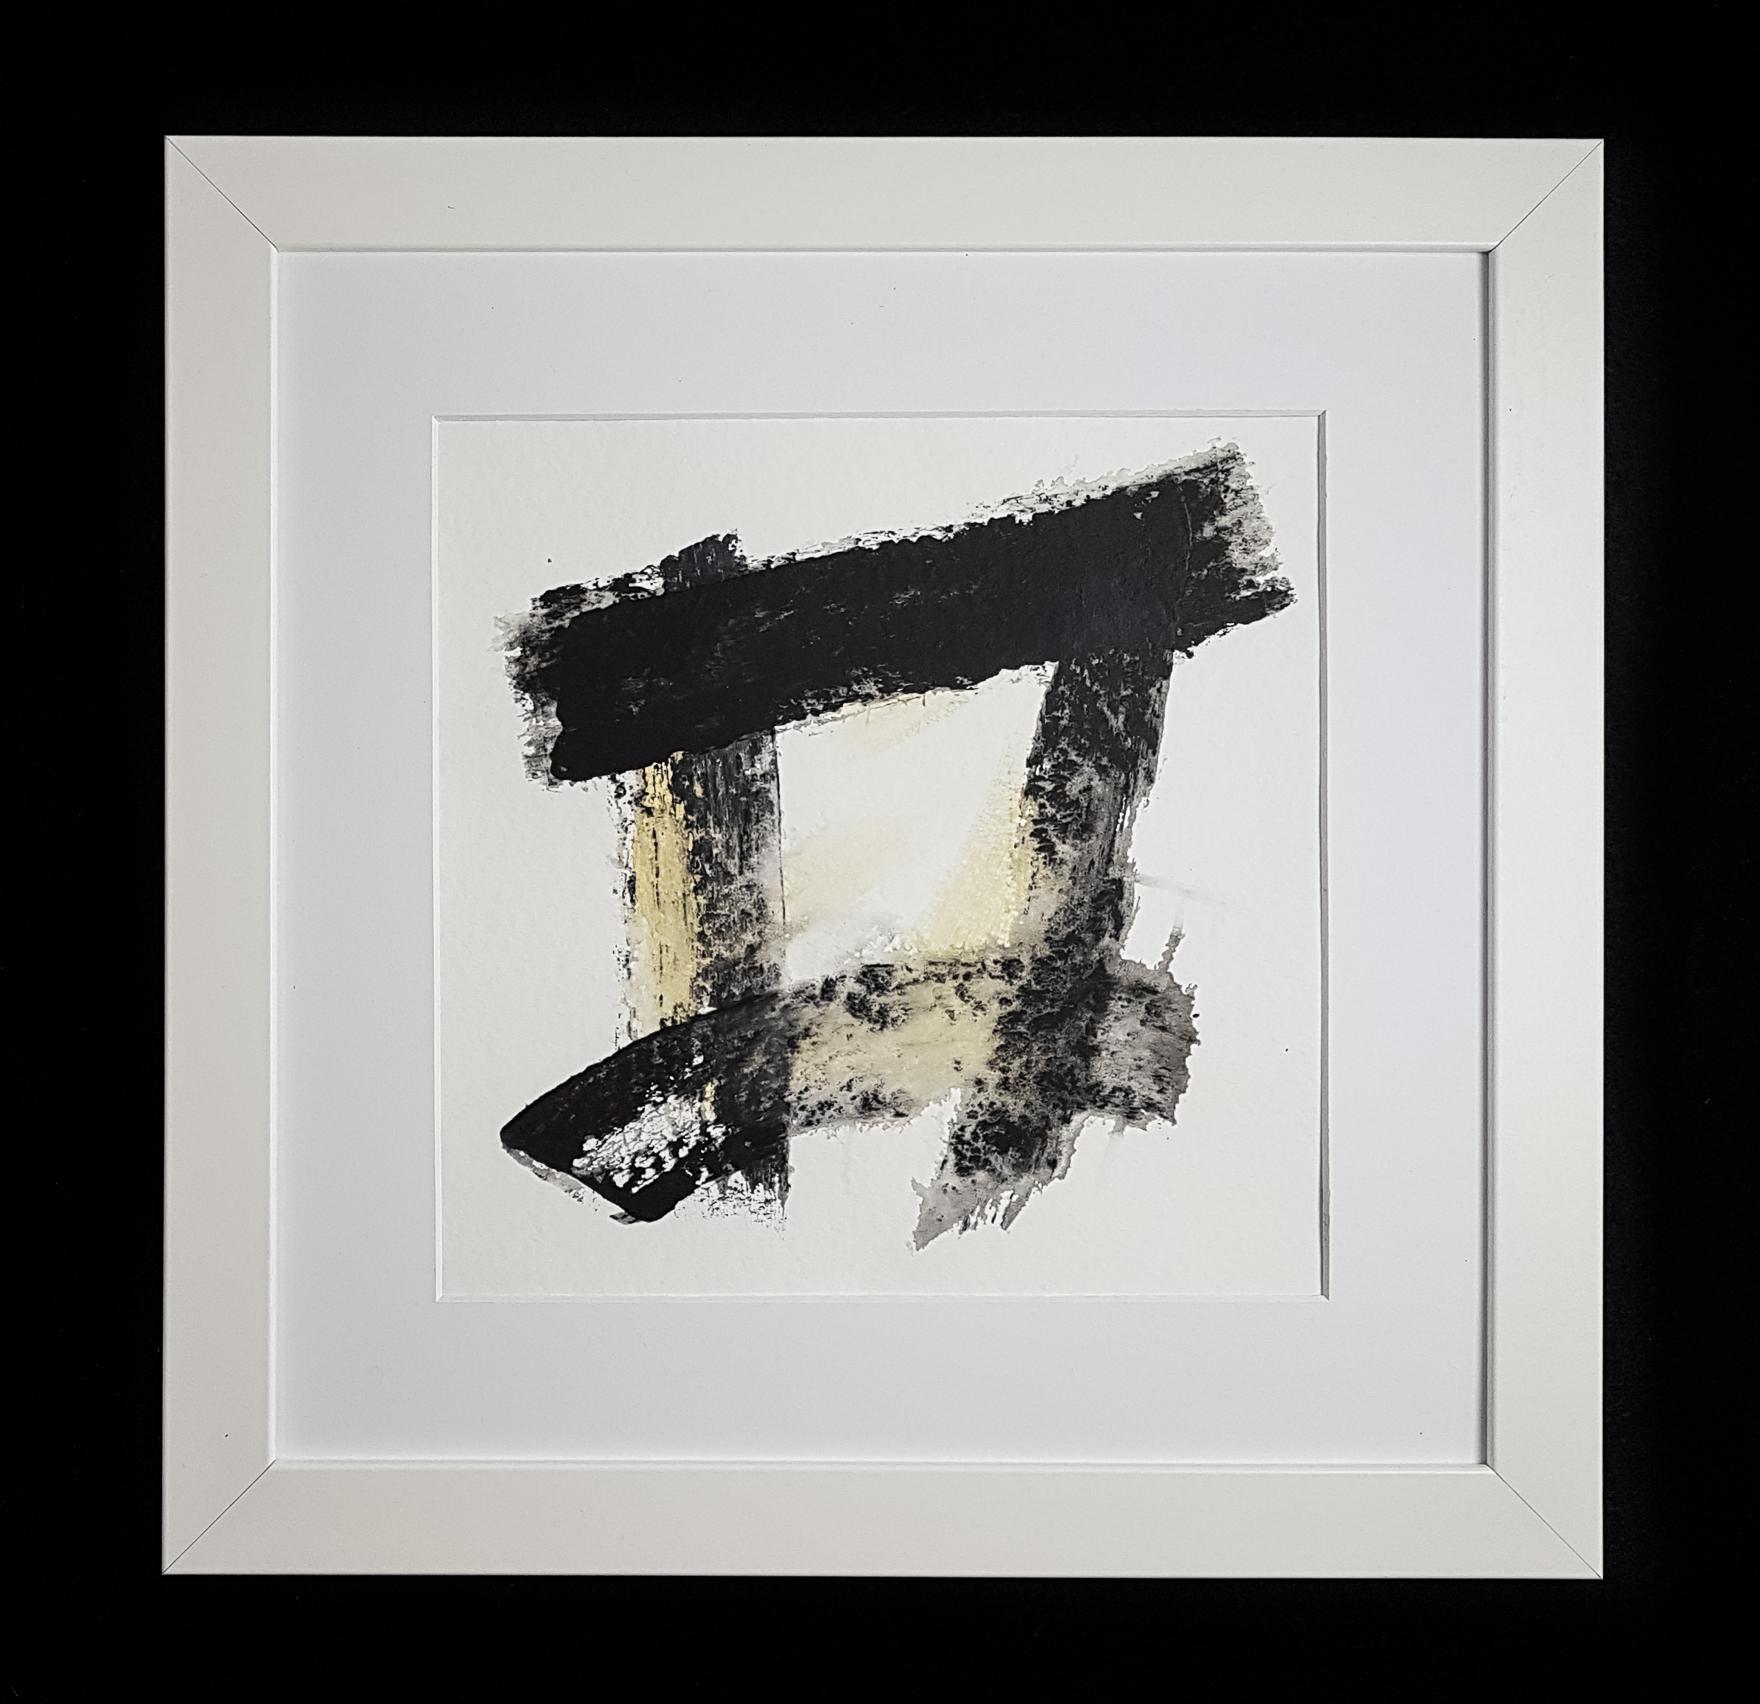 Matthew G. Beall Asemic Squared 25 x 25 cm 2017 (4)